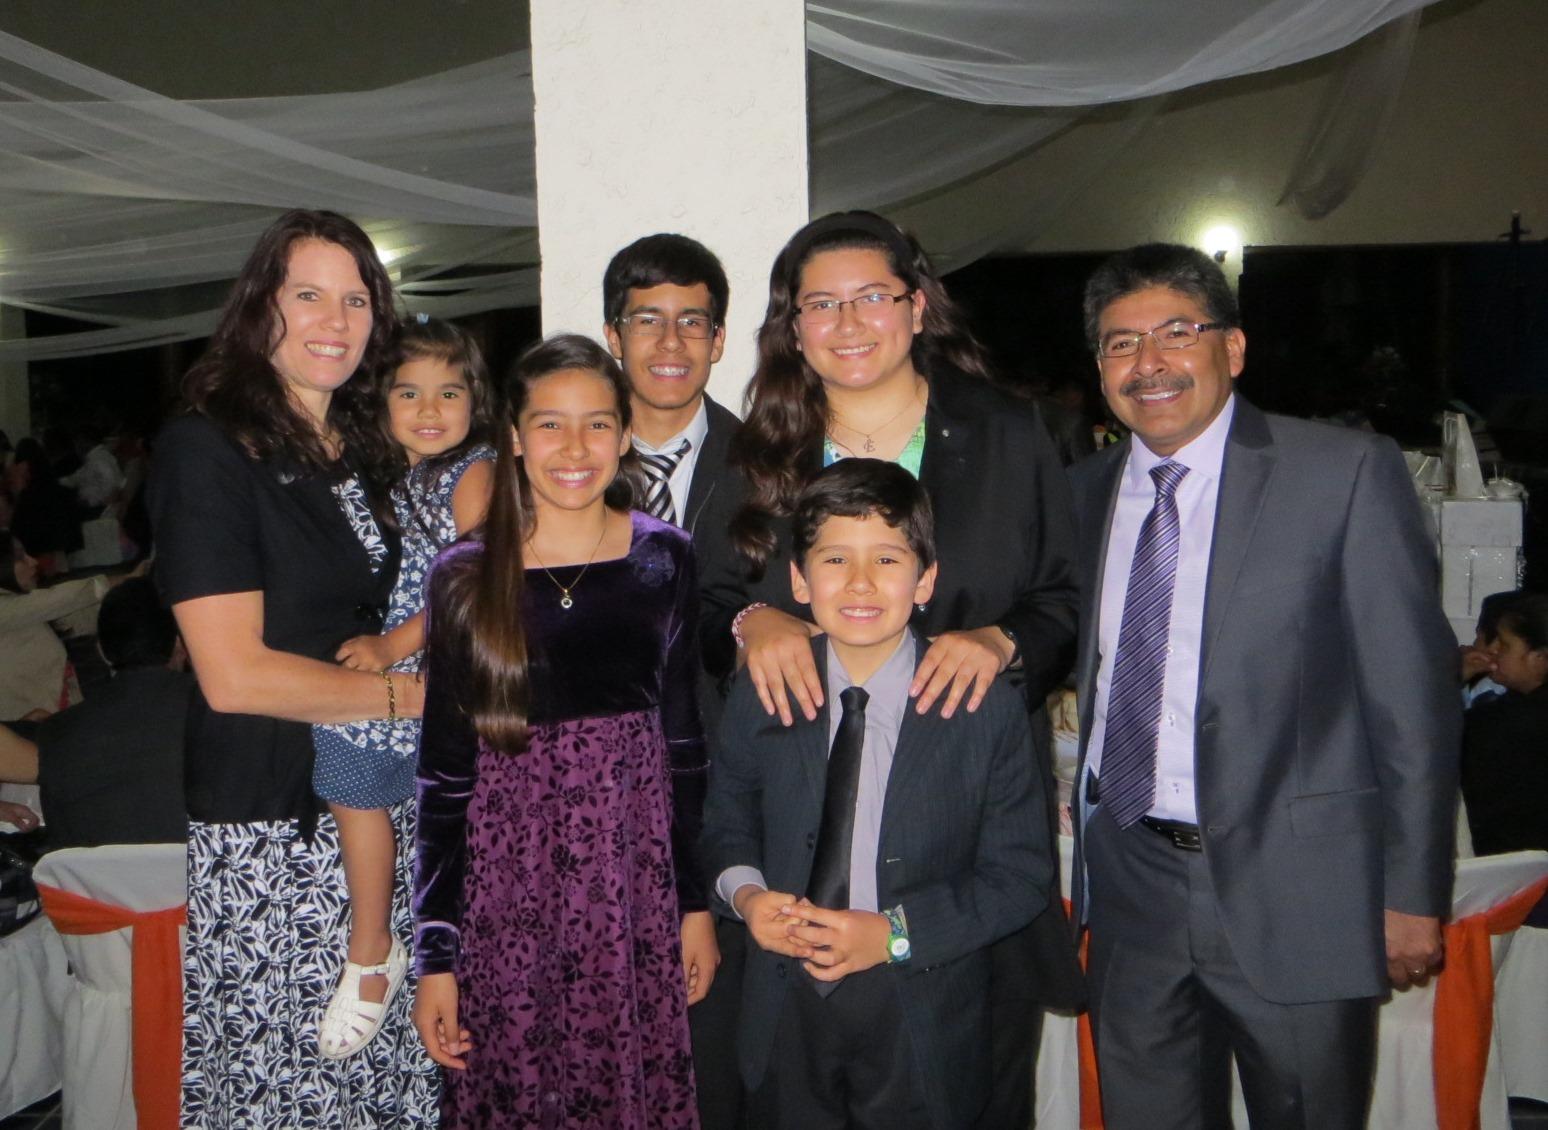 Vivanco Family, June 2014: Laura, Bethany (4 1/2), Kelly (12), Caleb (15), Emily (18), Nicolas (9) & Manuel